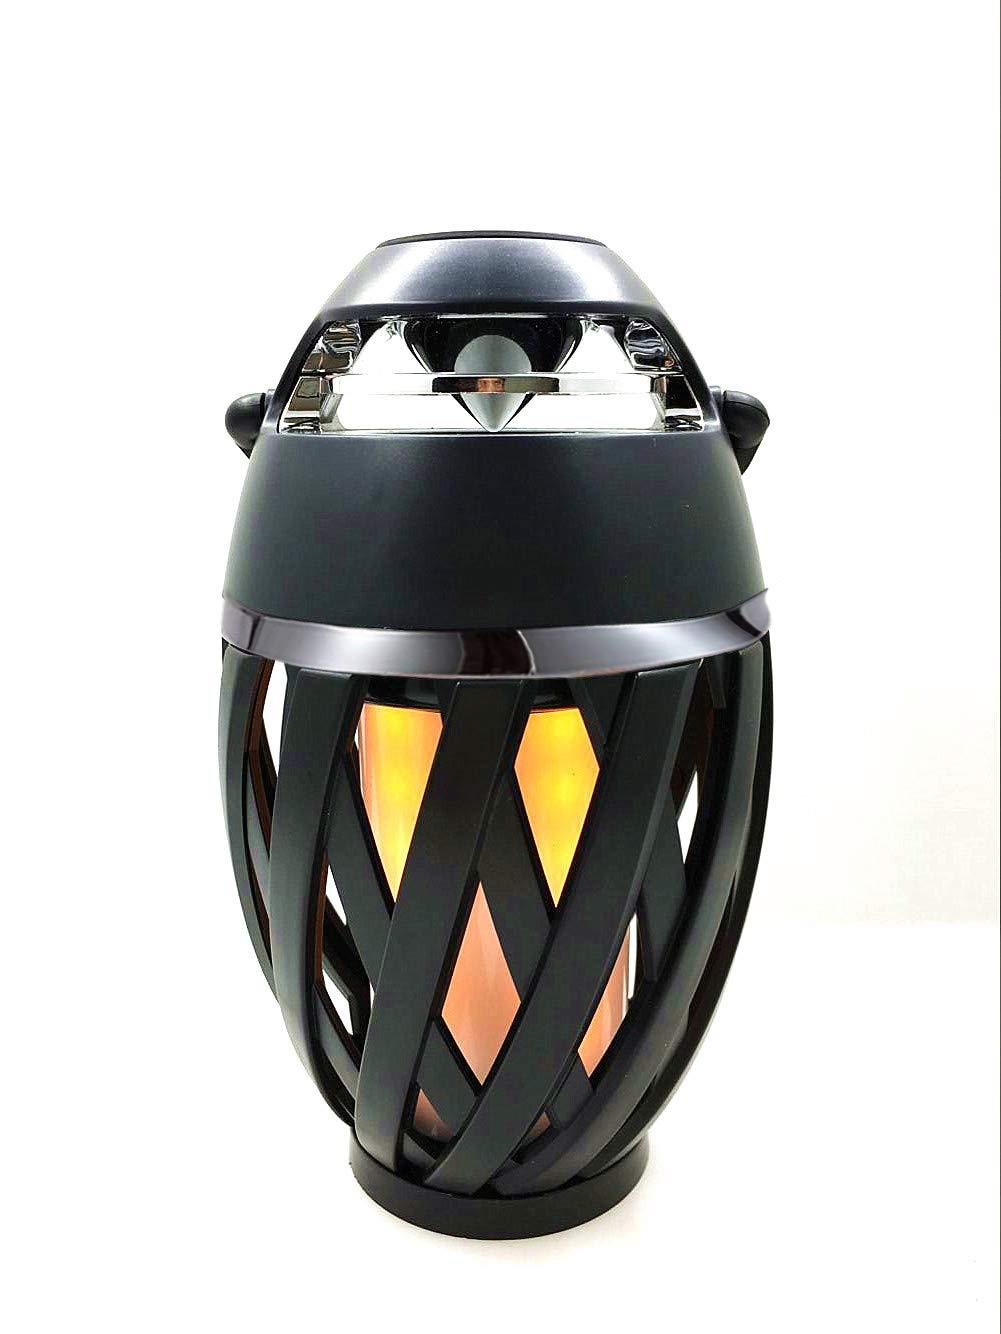 CFIKTE Portable Small Flame Light Bluetooth Speaker/Creative